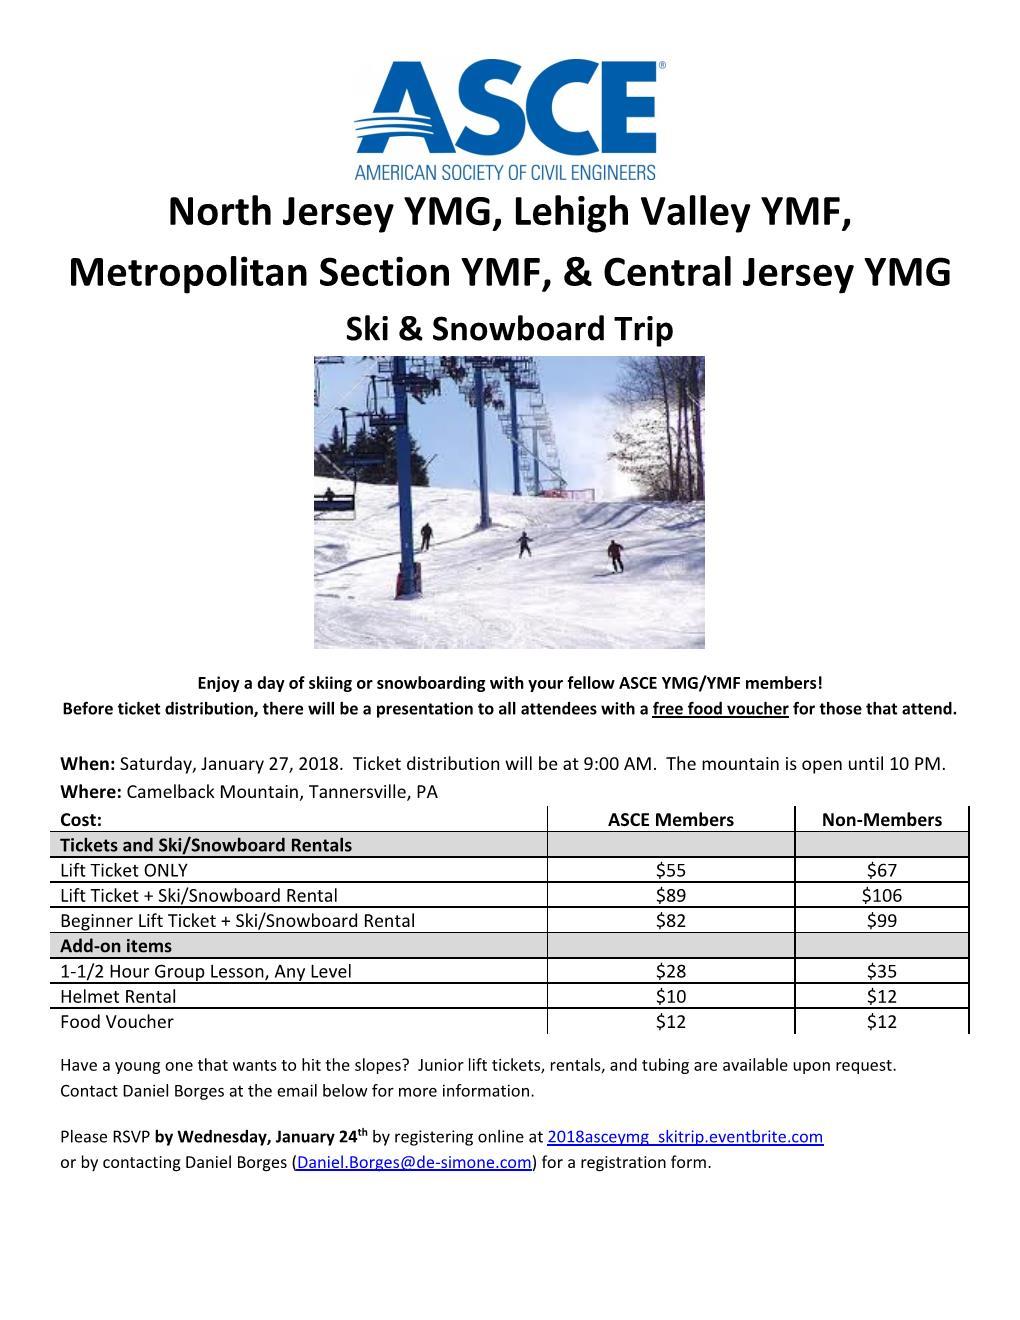 2018 ASCE Ski Trip Flyer.jpg